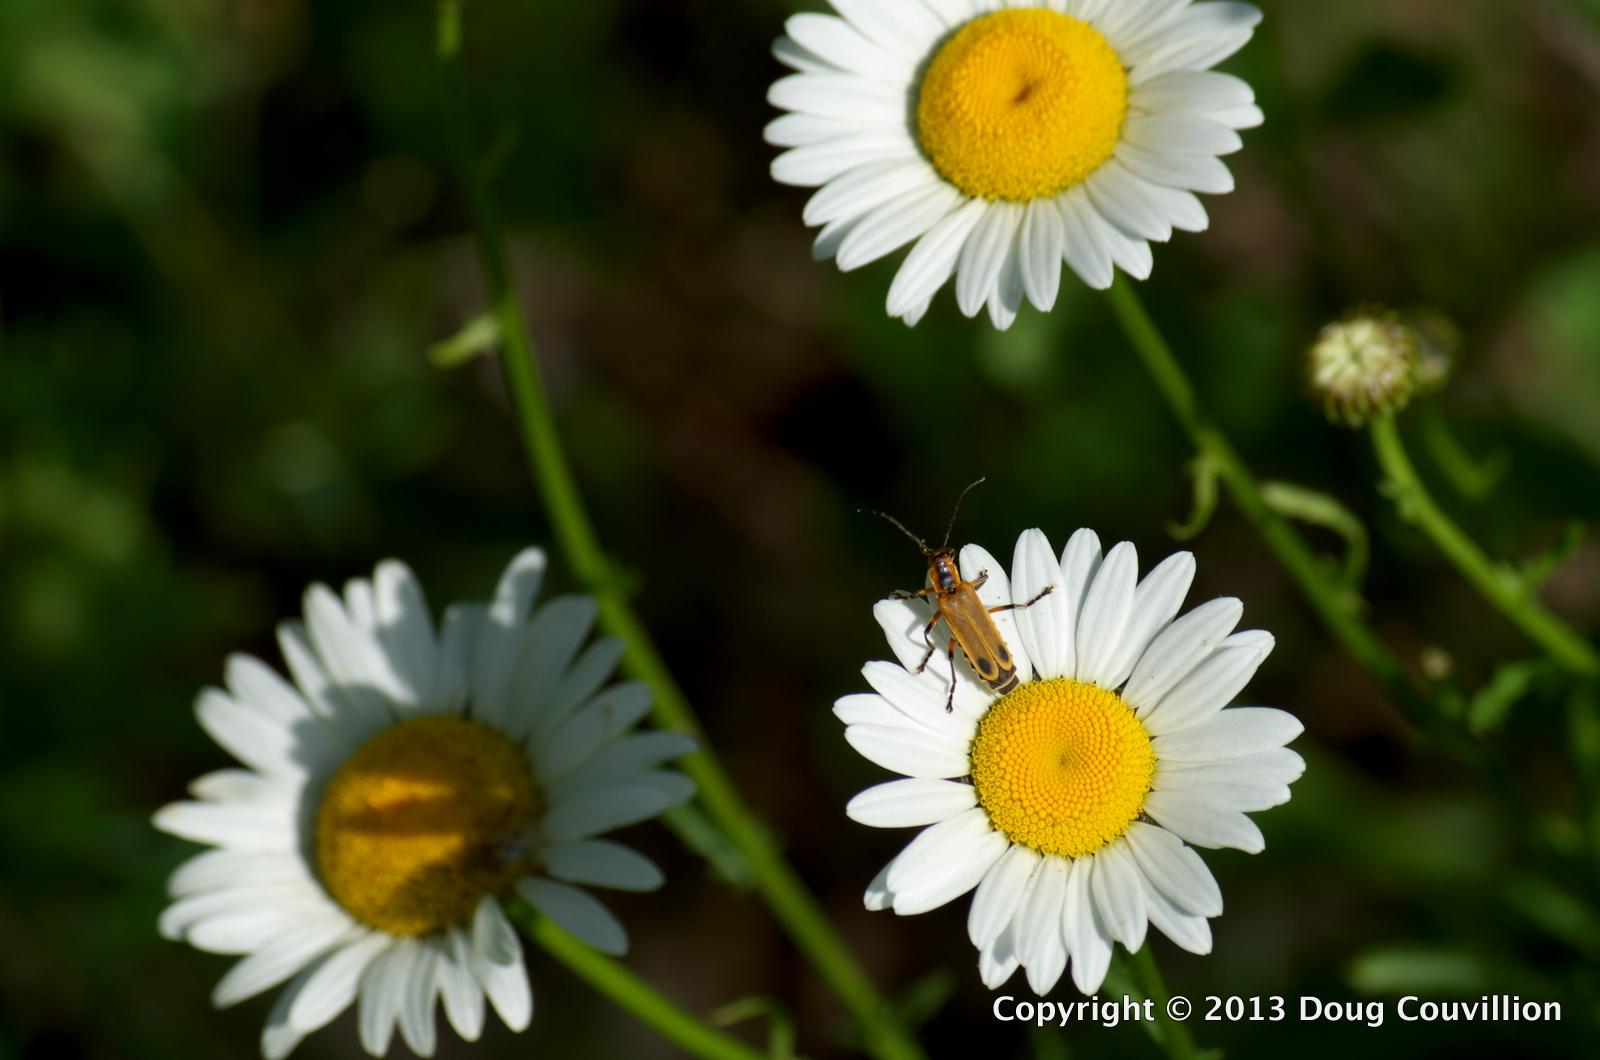 photograph of a beetle on a daisy flower